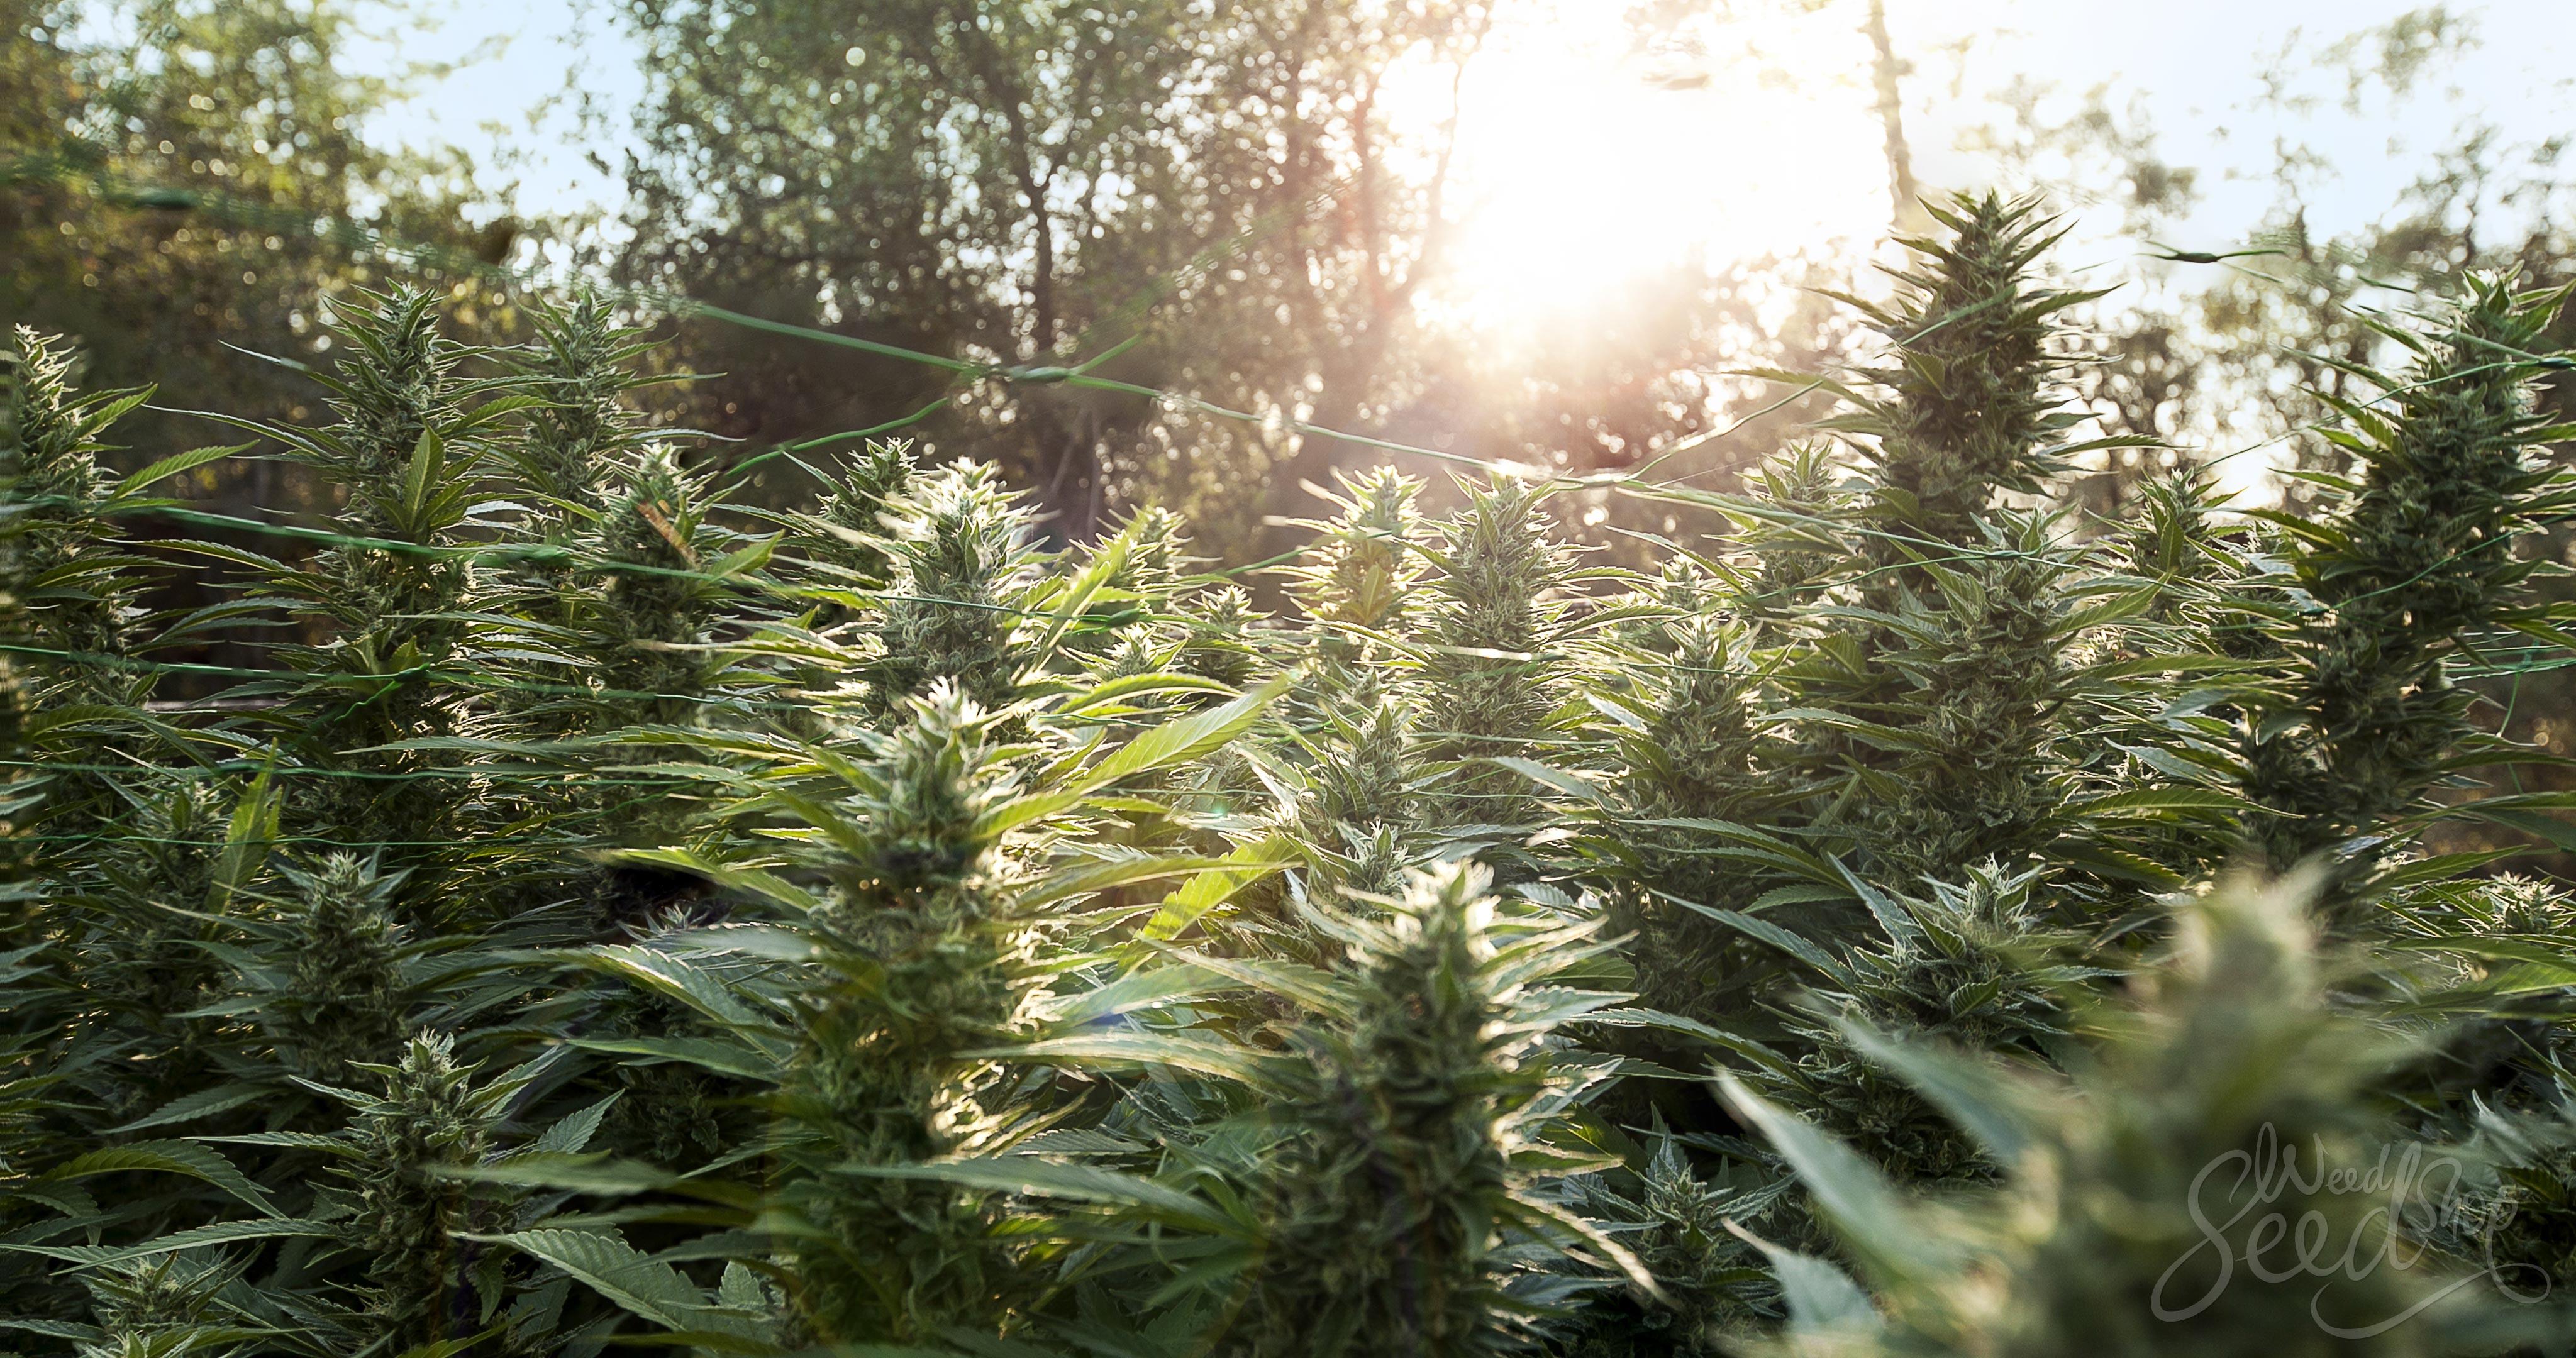 How To Grow Organic Marijuana – Essential Guide For an Organic Marijuana Garden